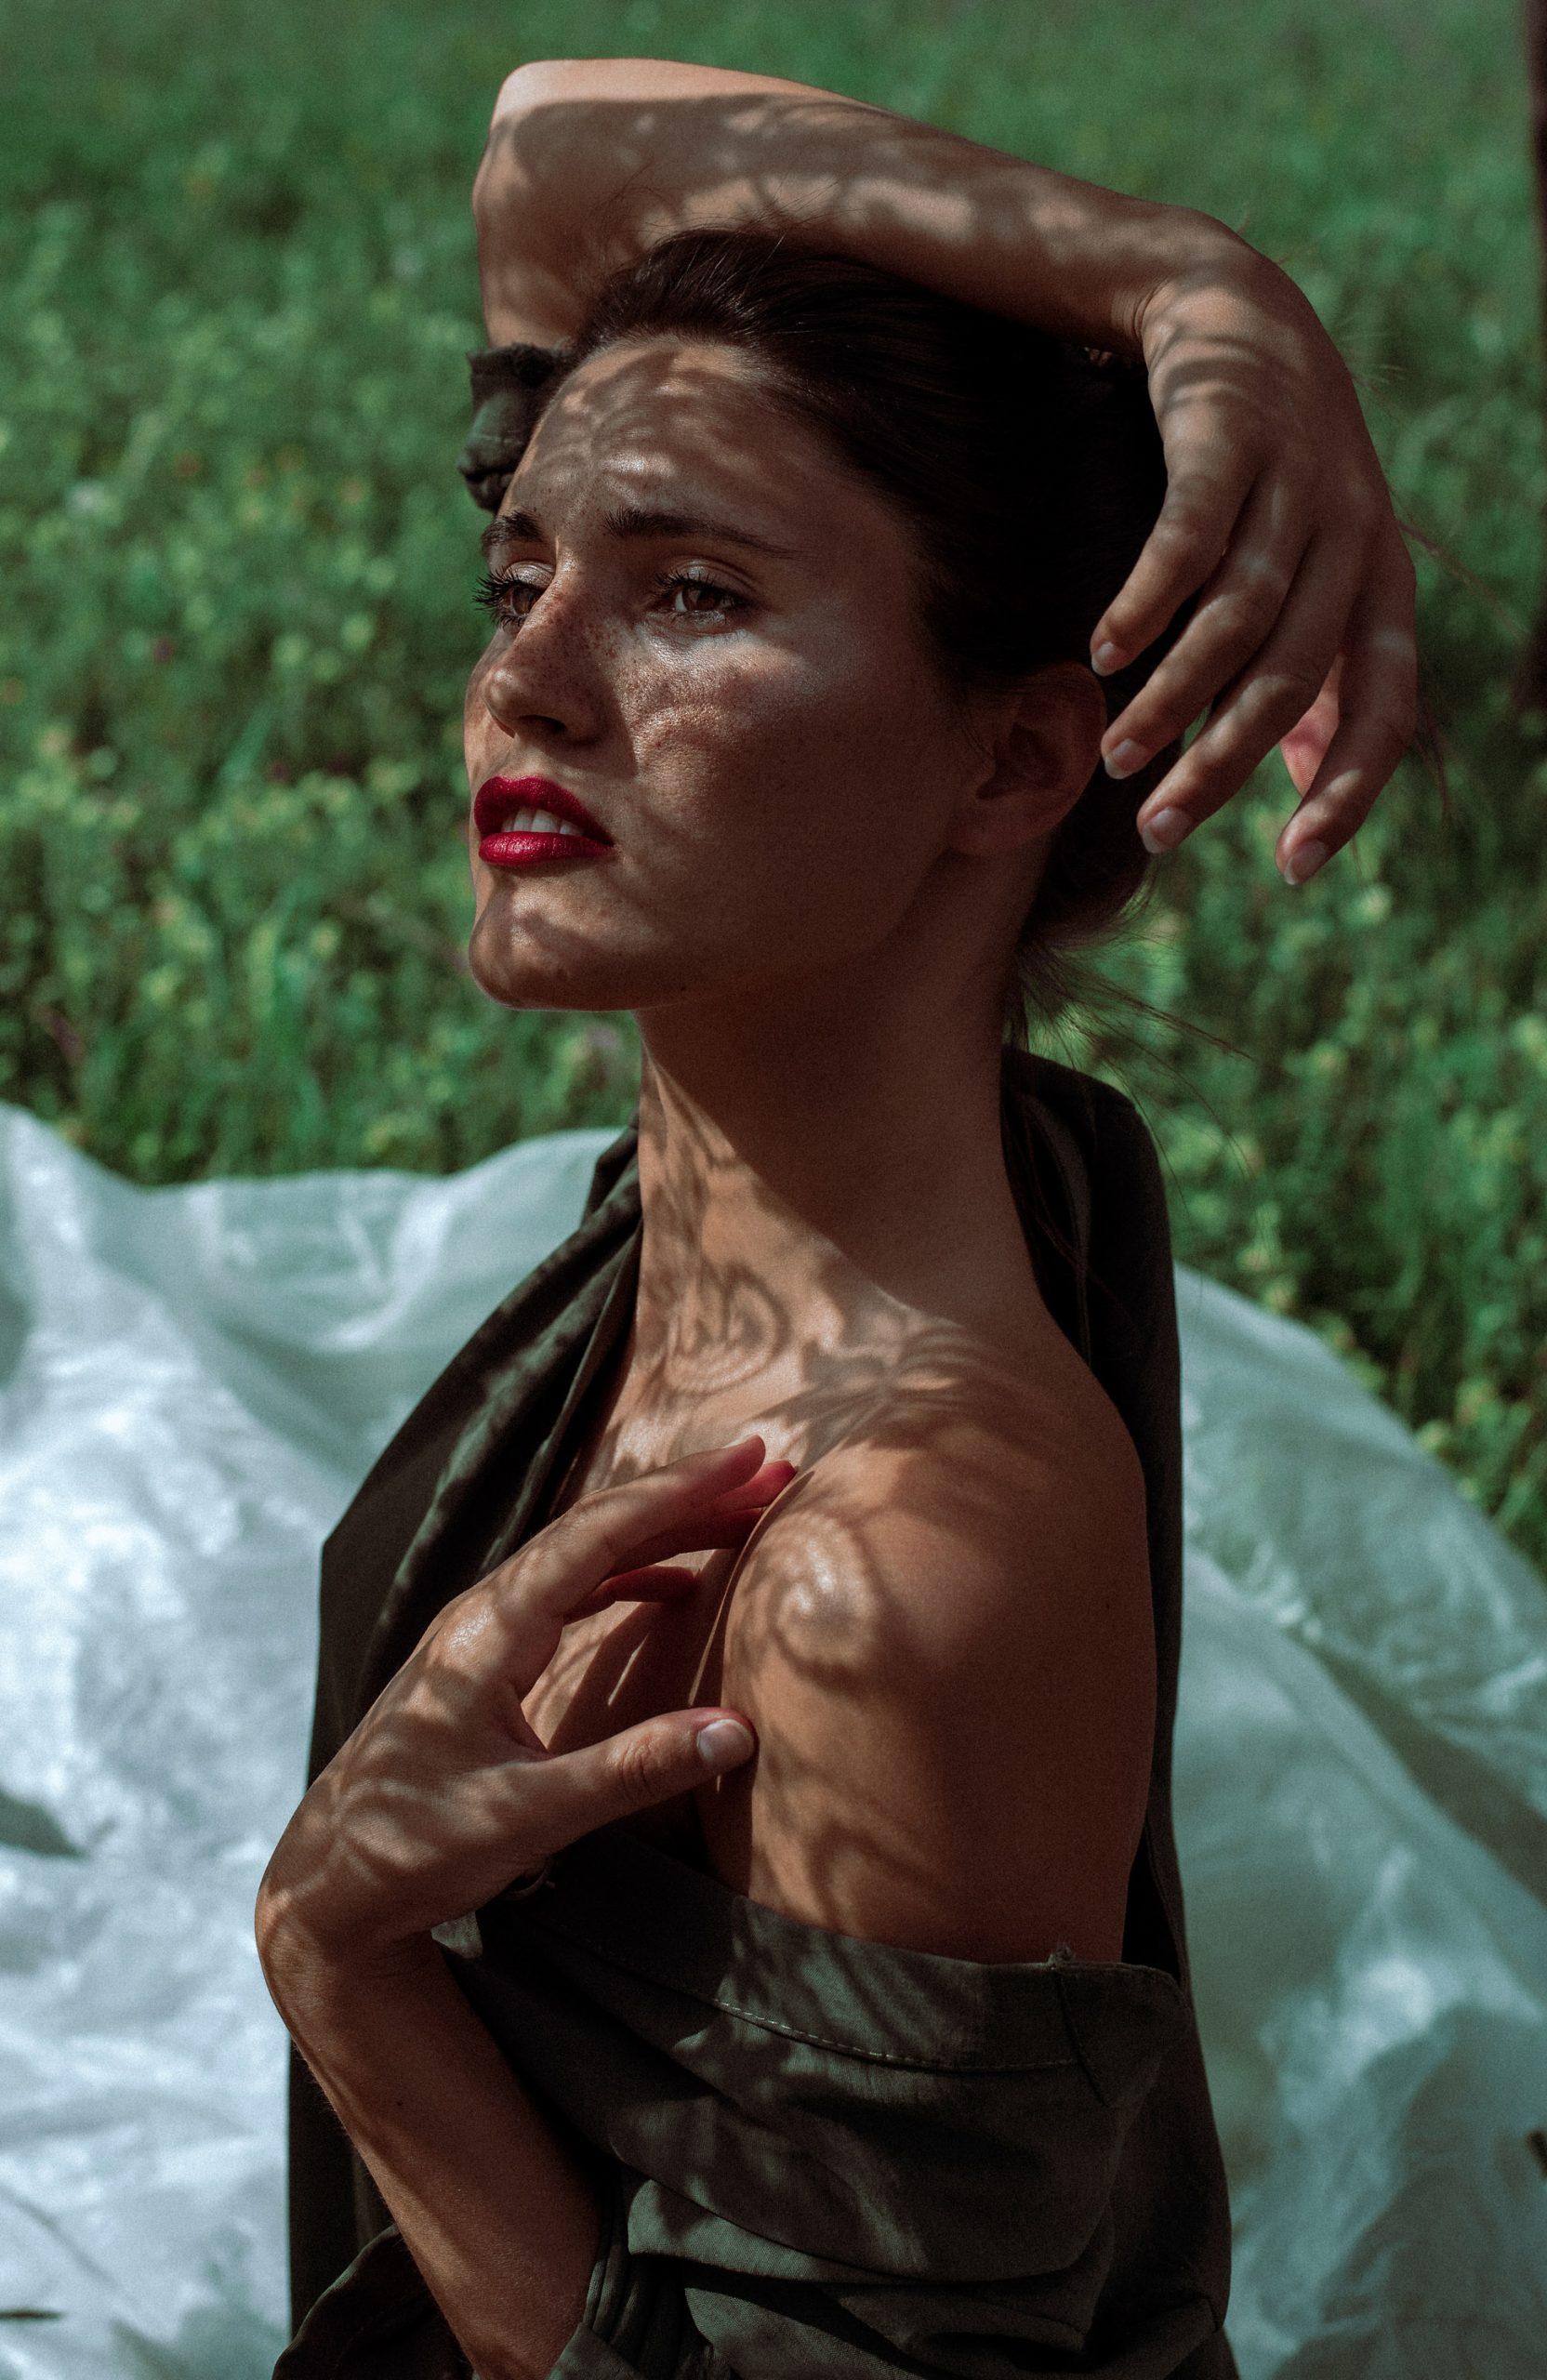 Categorie: Boudoir & Nude, Fine Art, Glamour, Portrait; Photographer: ANNA D'AGOSTINO; Models: AGATA CARRARO, ALICE SergeantIce, CAMILLA SAVALLI, CHIARA PICCIN, FRANCESCA PELLEGRINI (Stella di Plastica), JULIETA BERTUZZI, MAMIKI NHAMPOSSE, MILENA BORTOT; Location: Belluno, BL, Italia